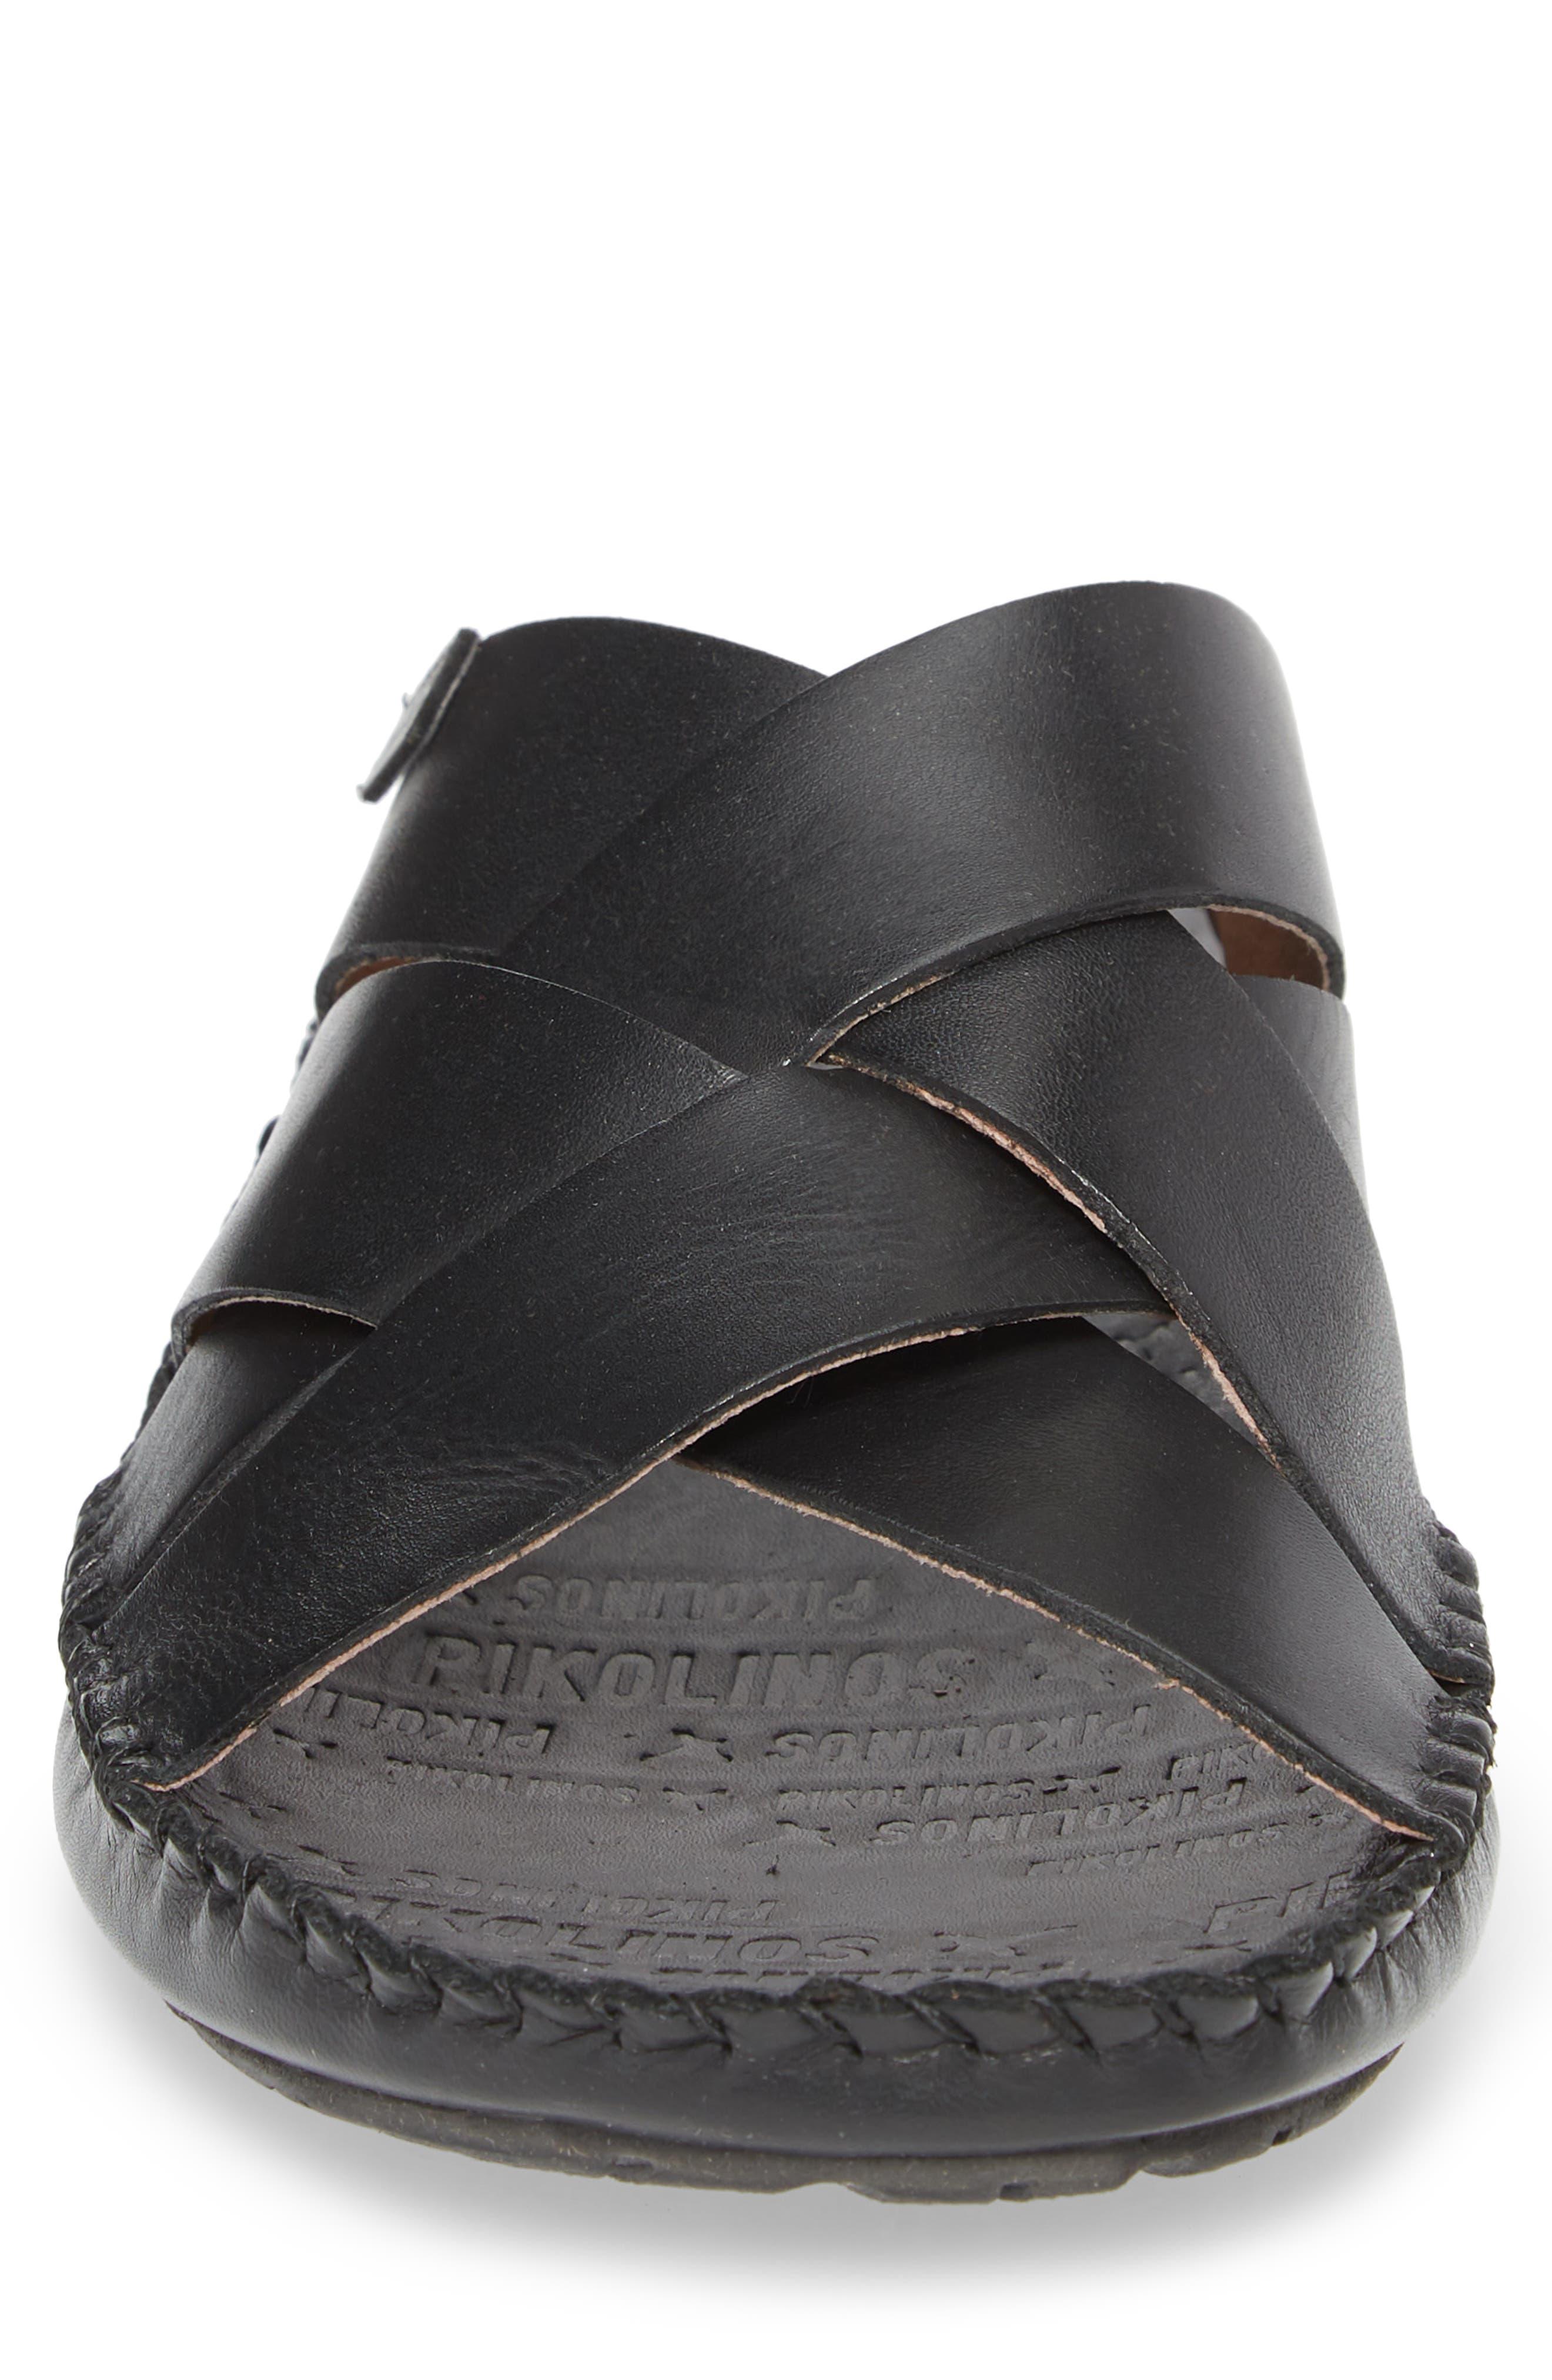 'Tarifa' Slide Sandal,                             Alternate thumbnail 4, color,                             Black Leather